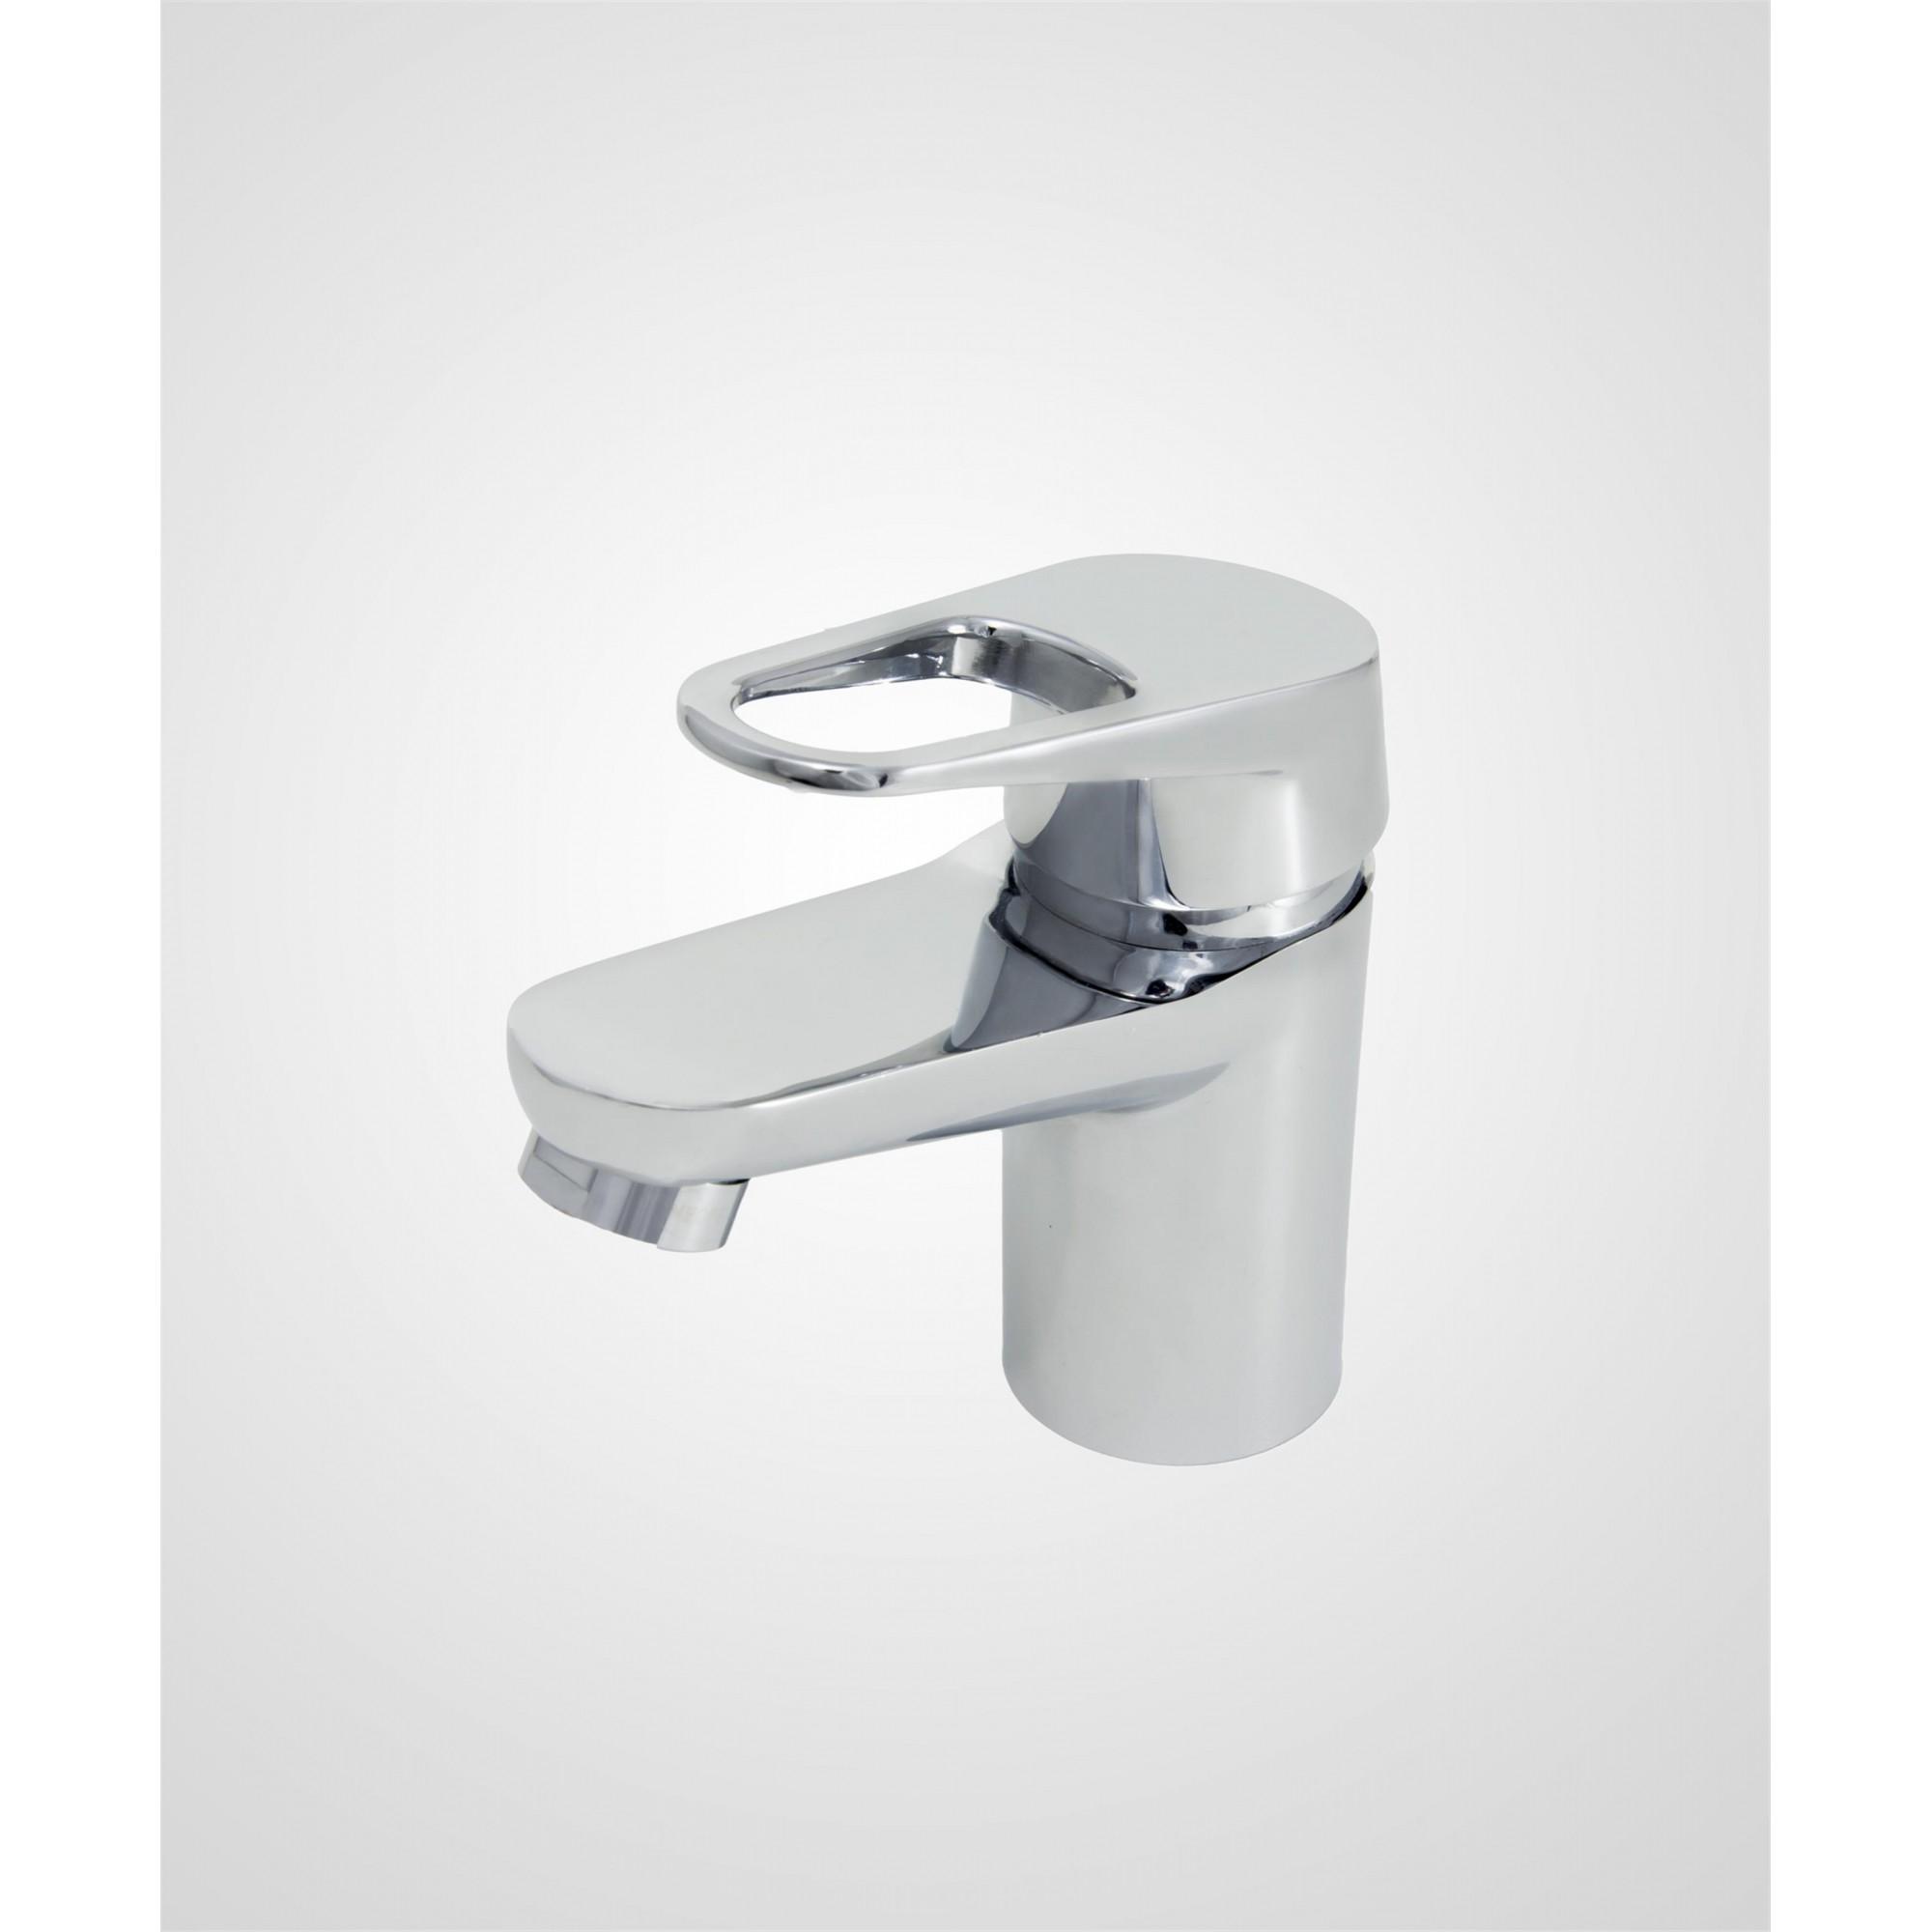 Misturador Monocomando Para Lavatório de Mesa Gap 2875 C75 Perflex